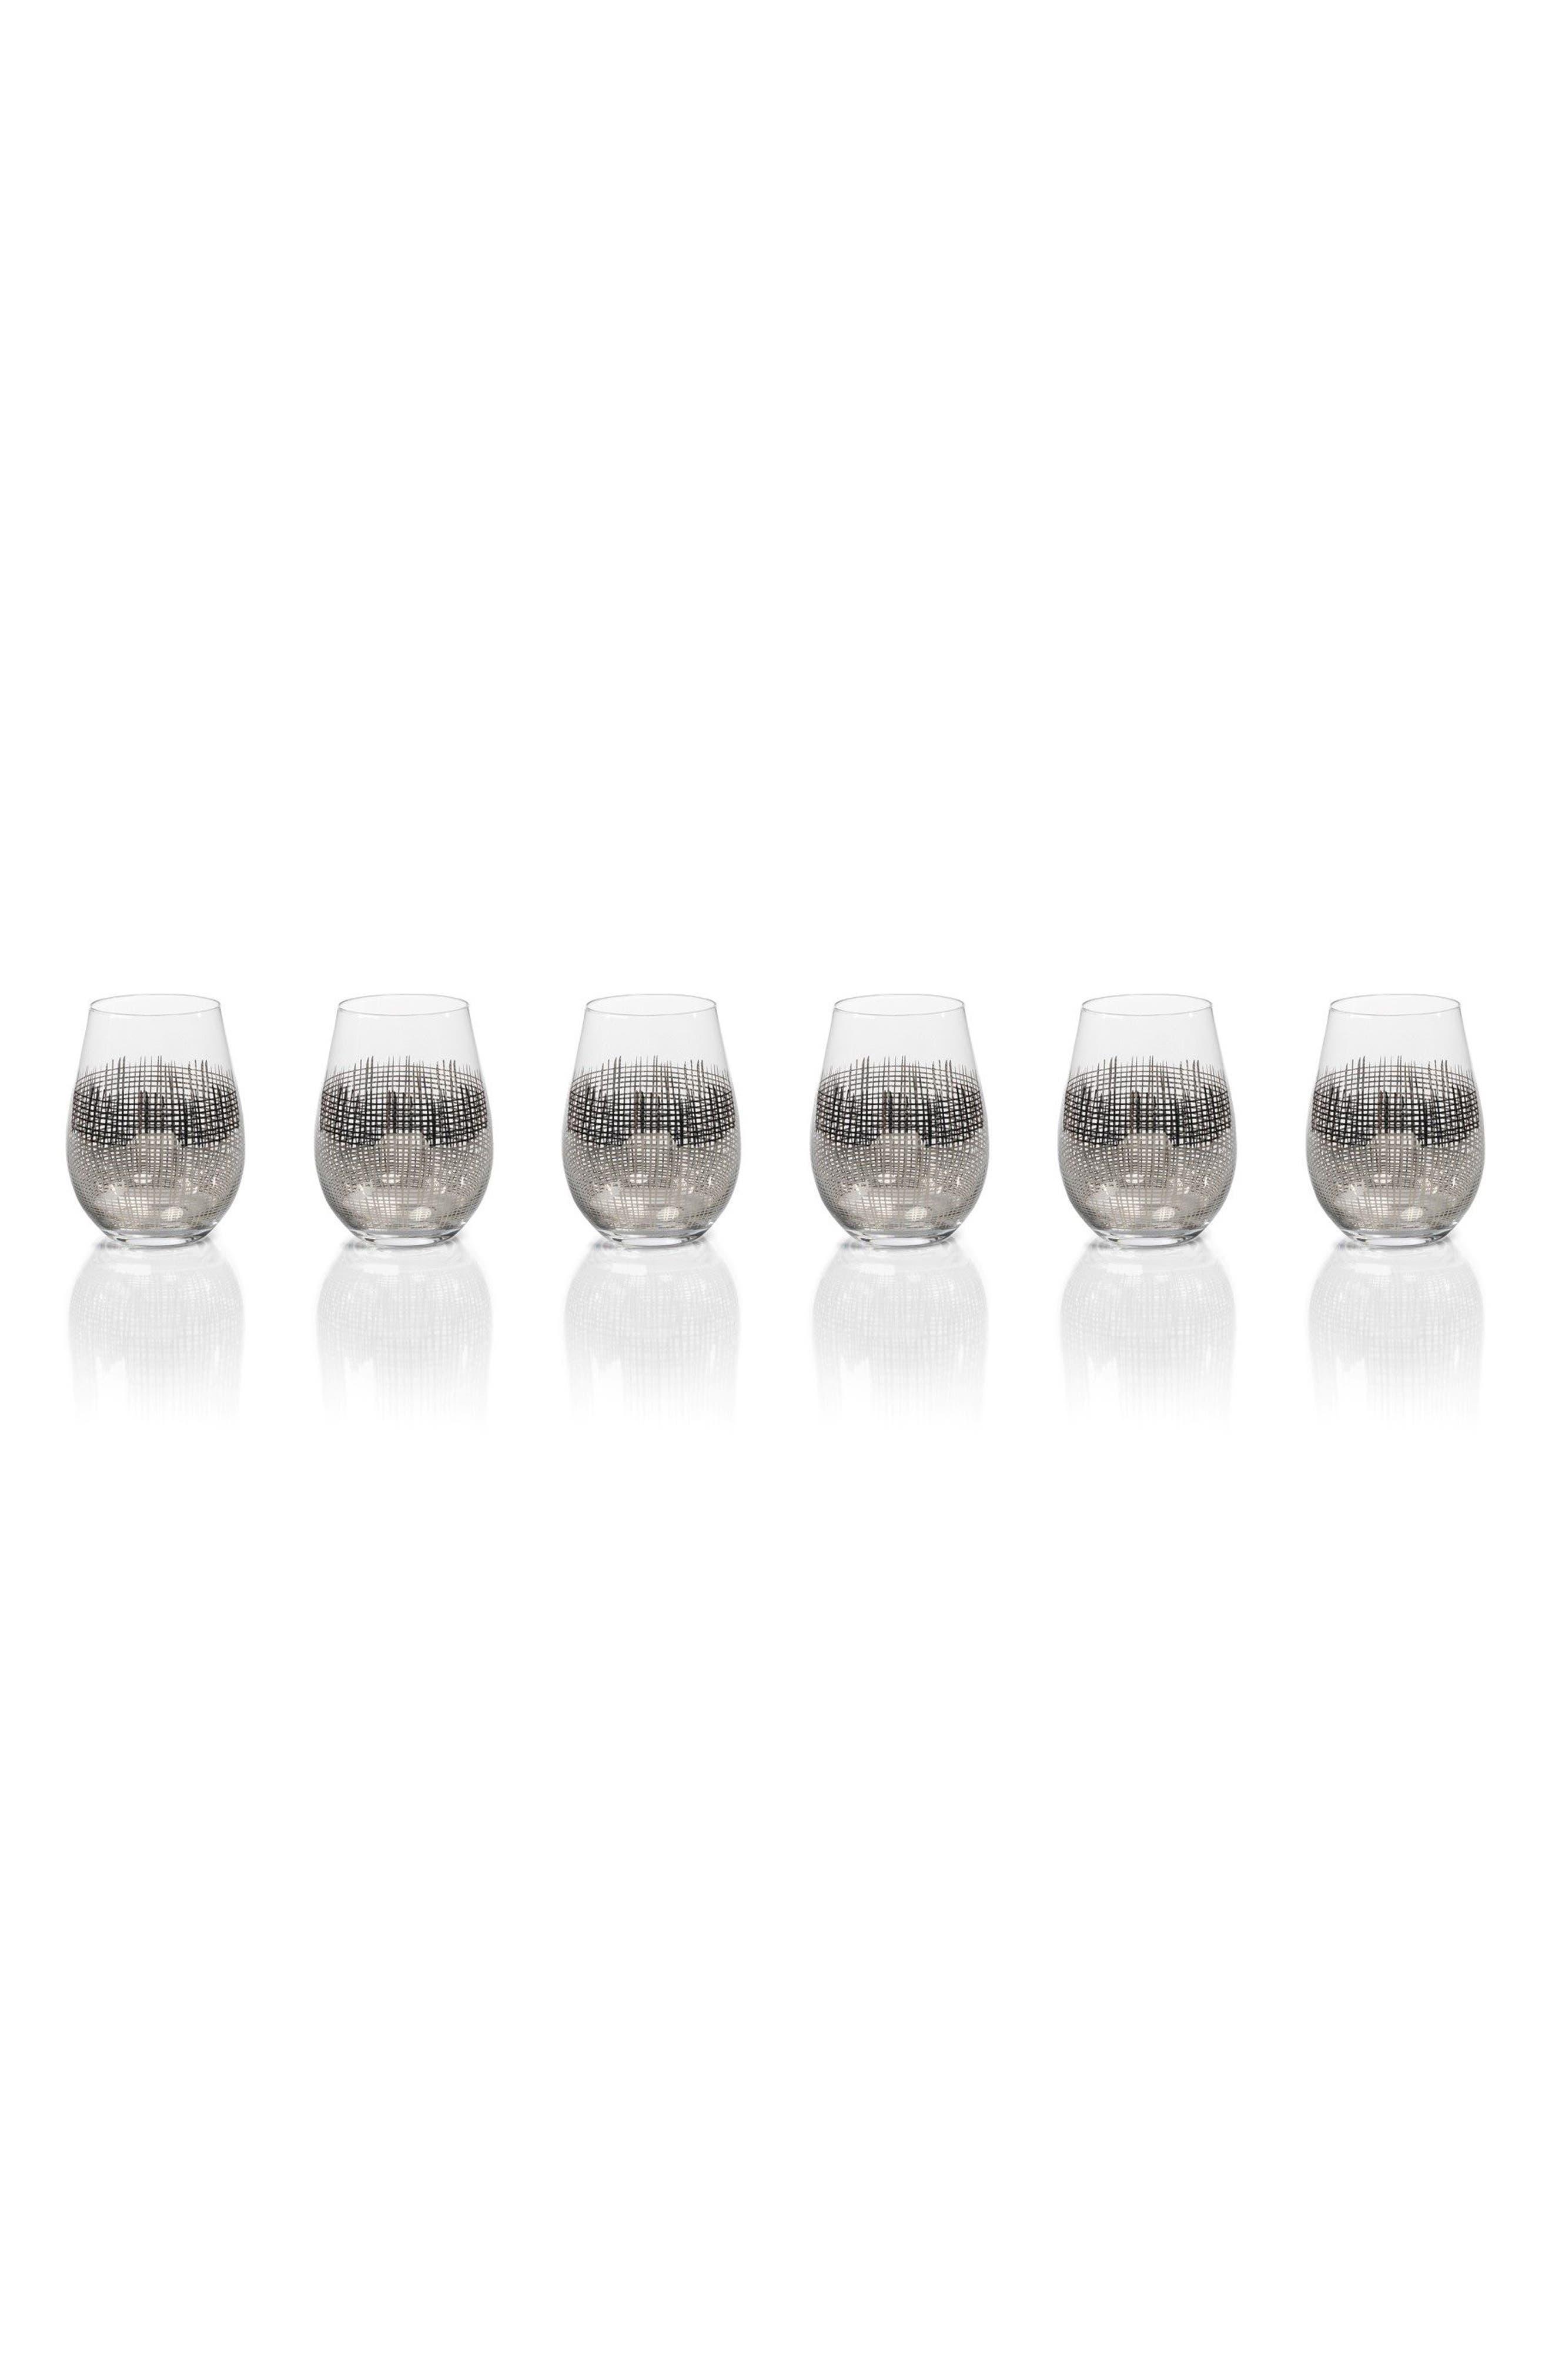 Alternate Image 1 Selected - Zodax Reza Set of 6 Stemless Wine Glasses